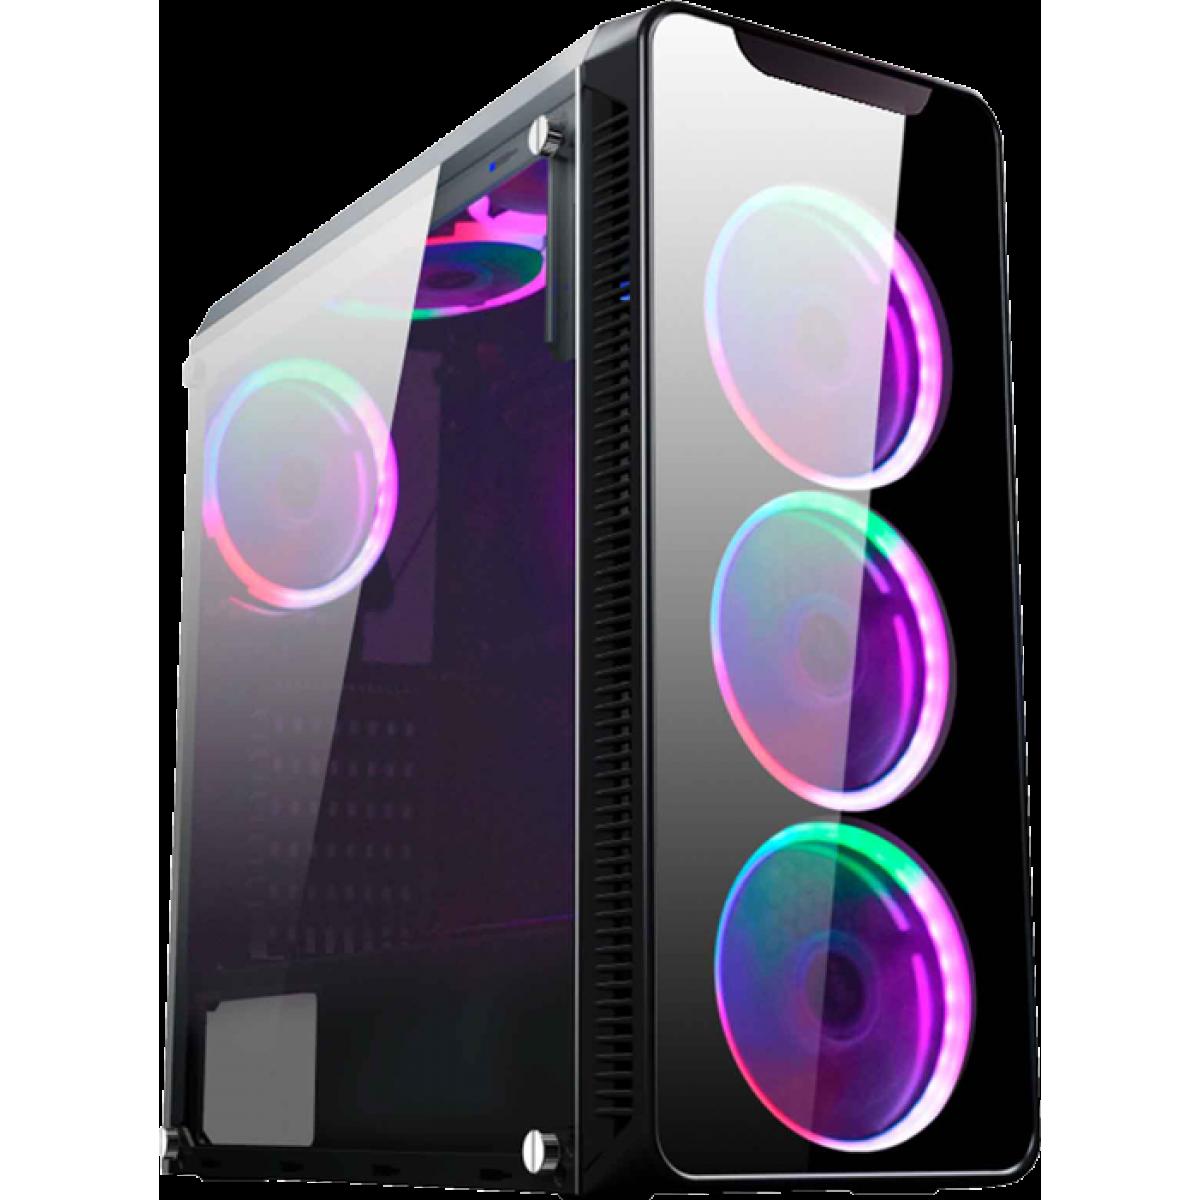 Gabinete Gamer K-mex Infinity I, Mid Tower, Com 3 Fans, Lateral de Acrílico, Black, S-Fonte, CG-01G8